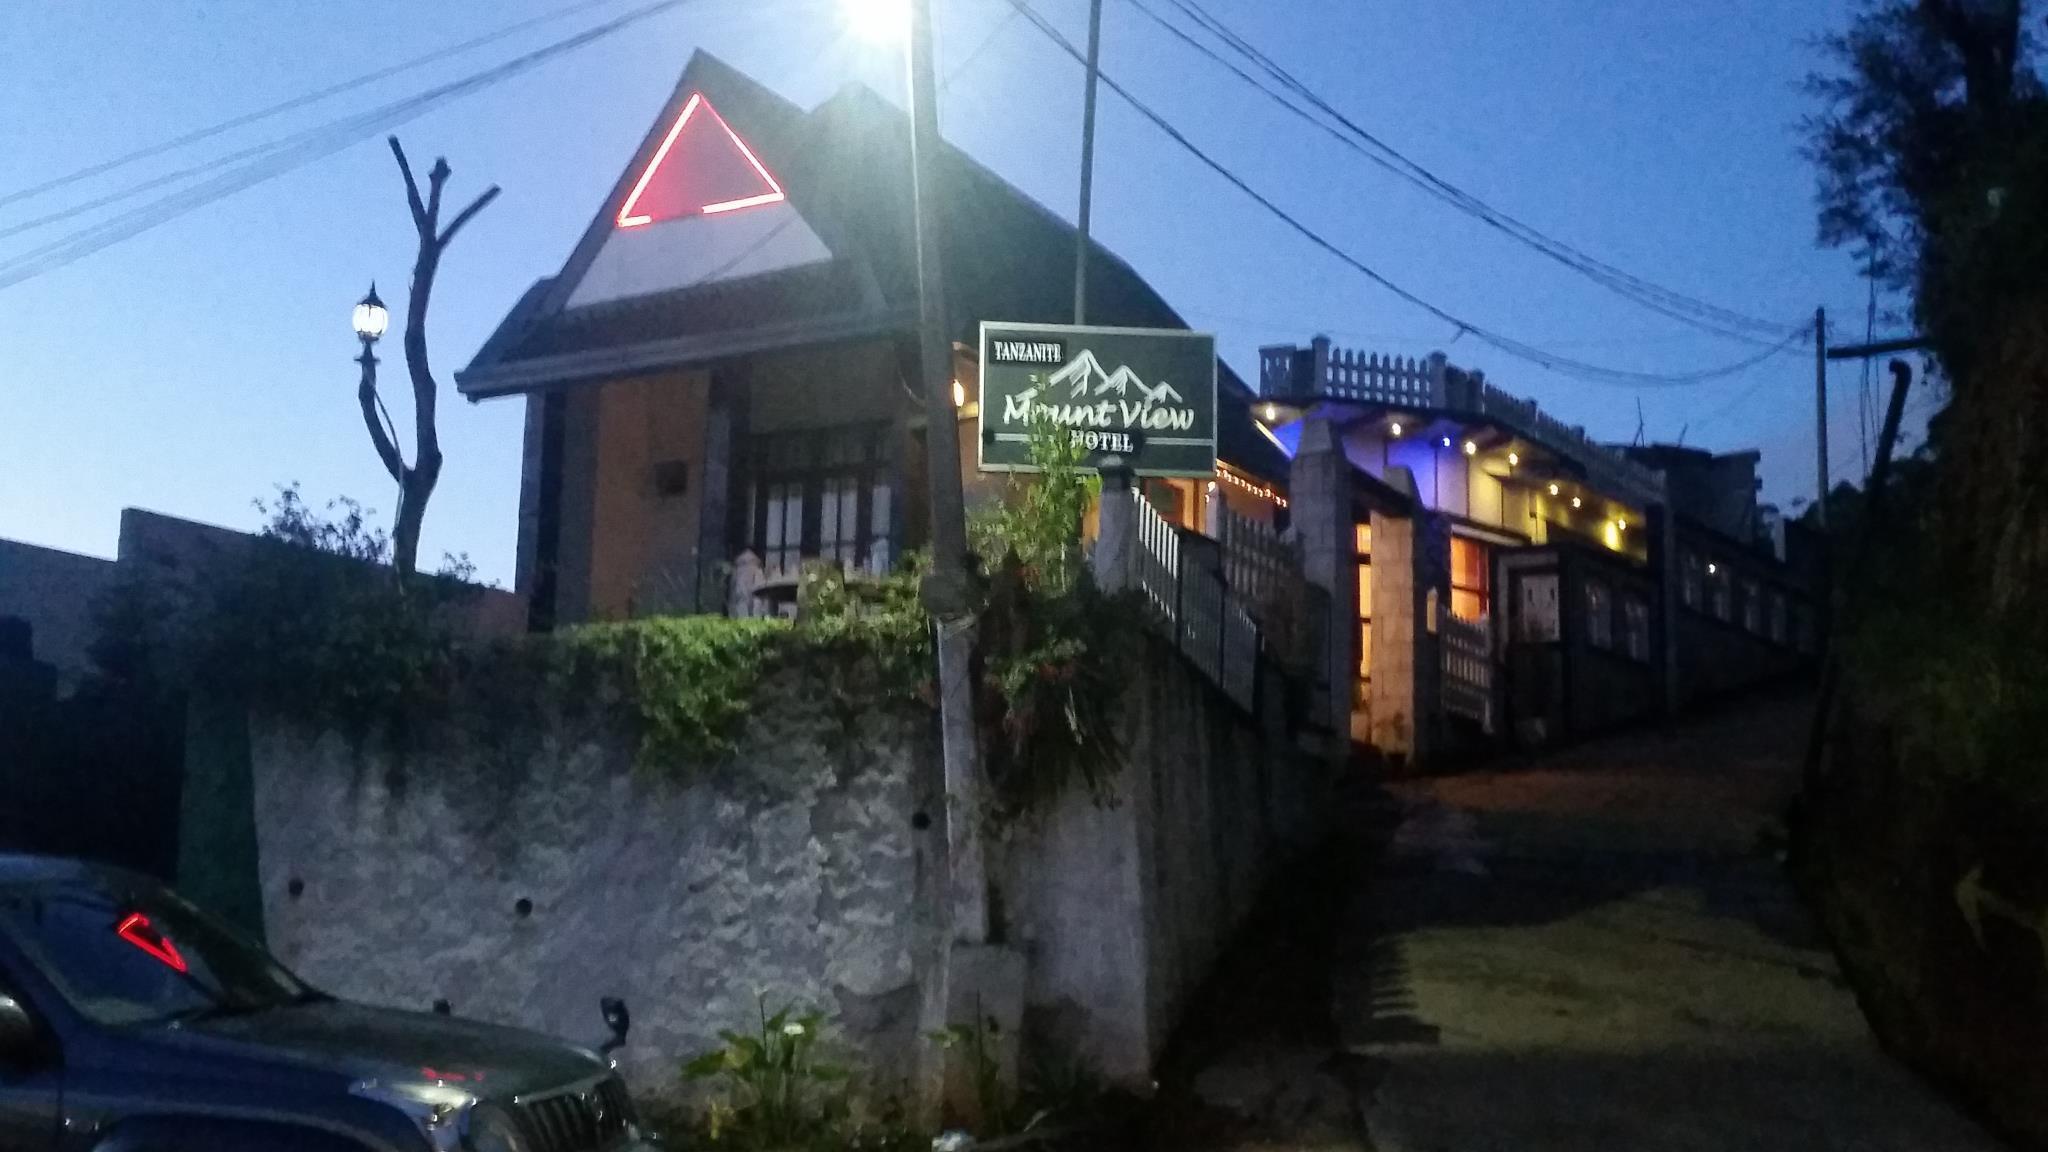 Tanzanite Mount View Hotel